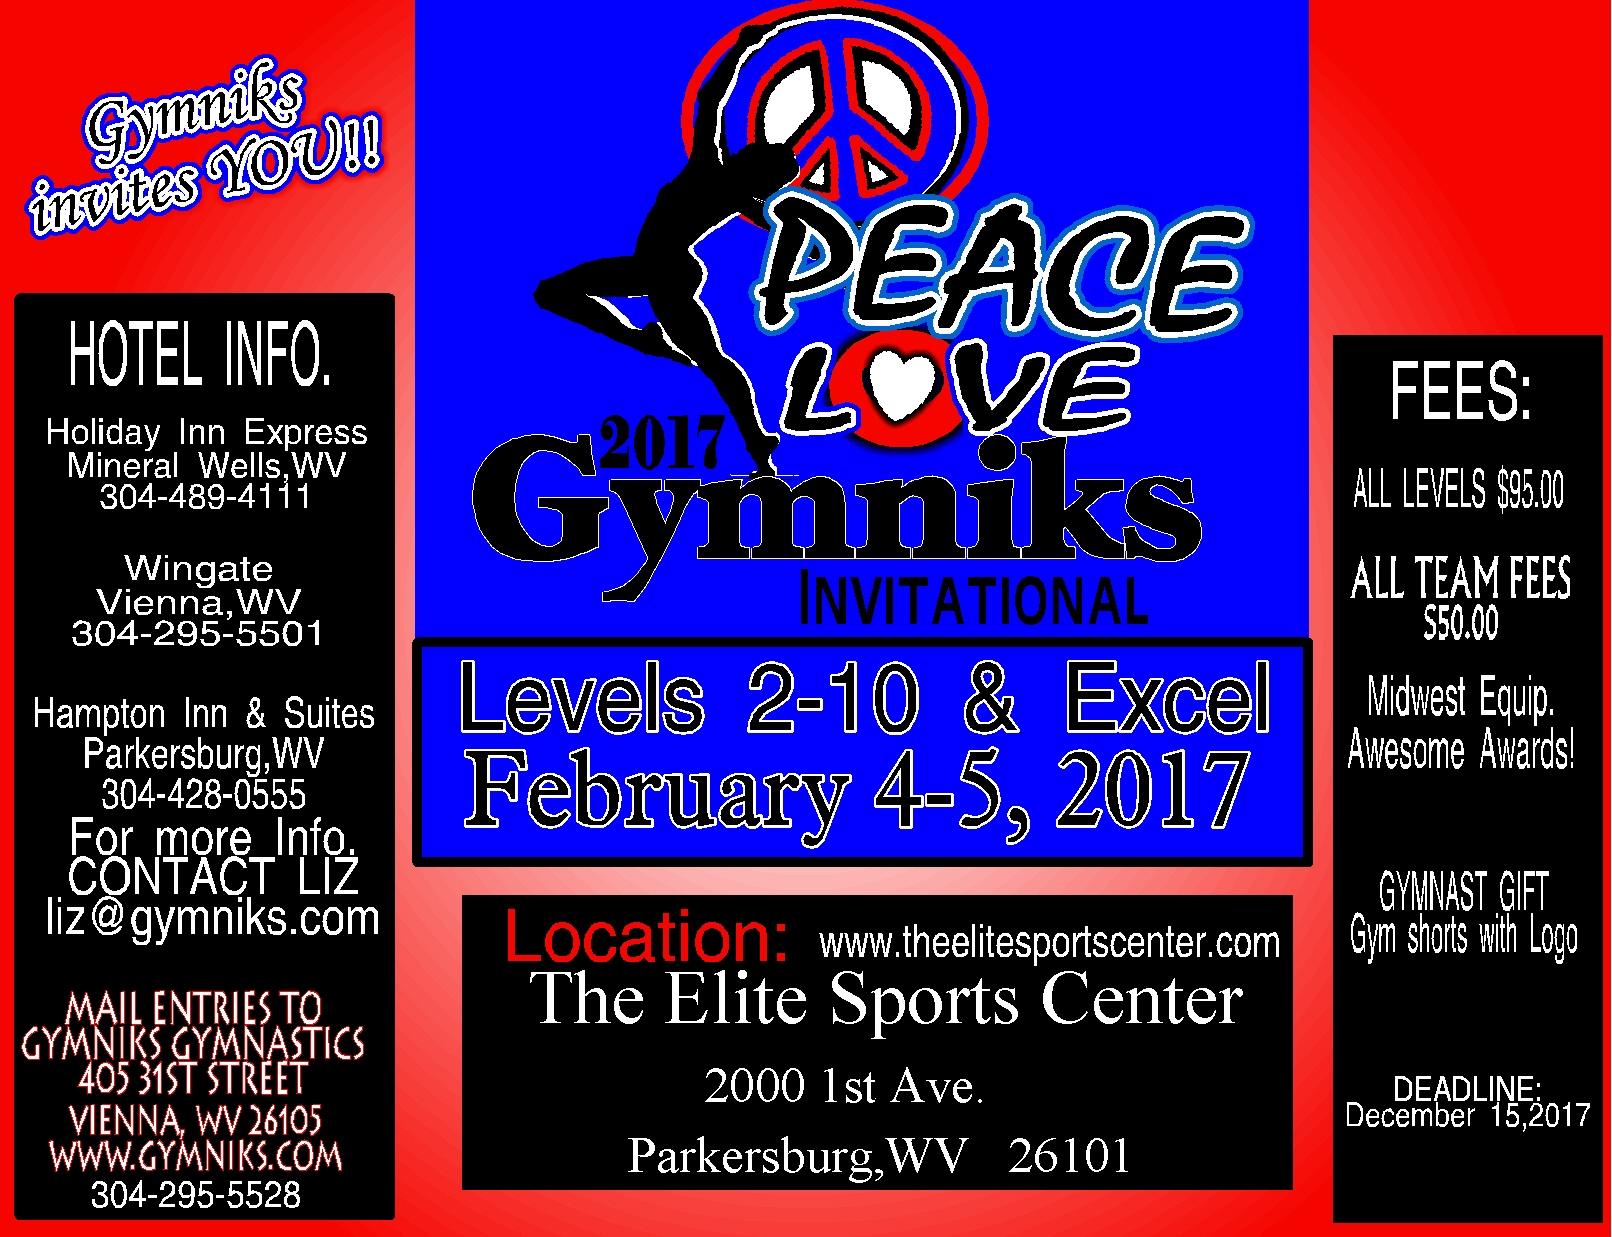 2017 Peace Love